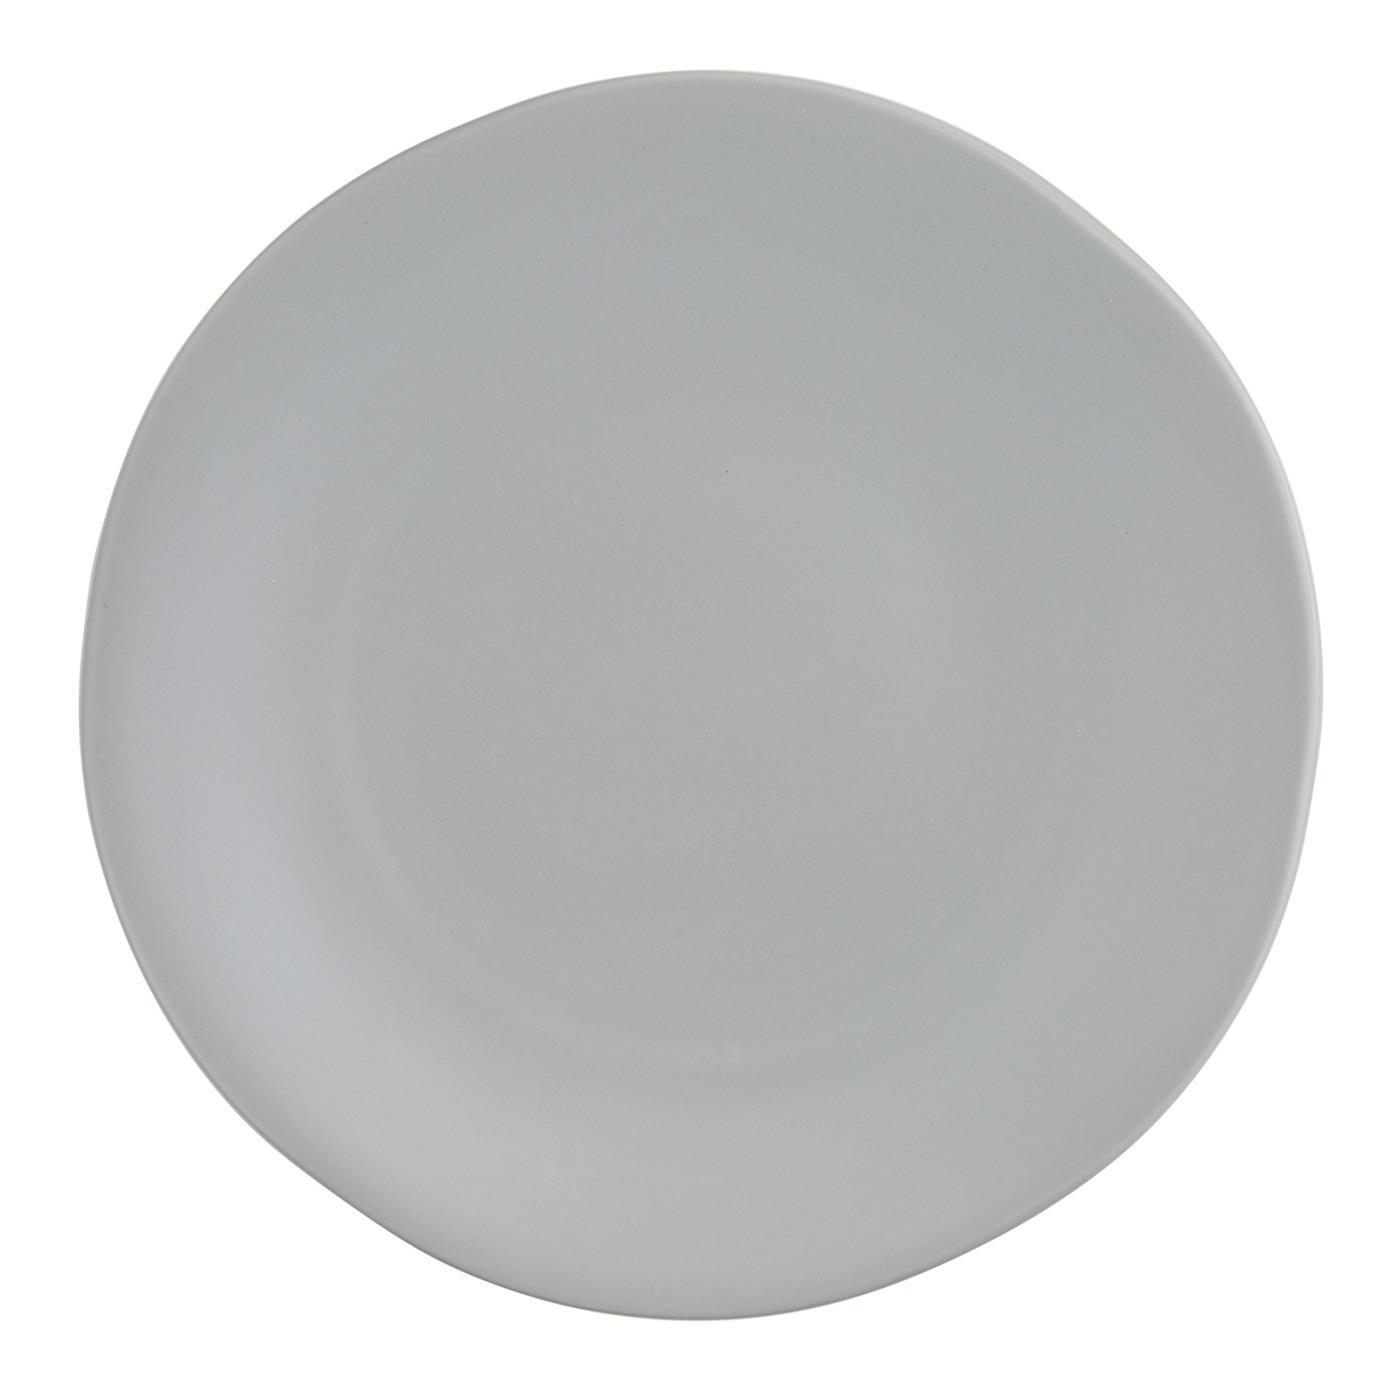 "Terra Dinner Plate 10.75"" - Grey"